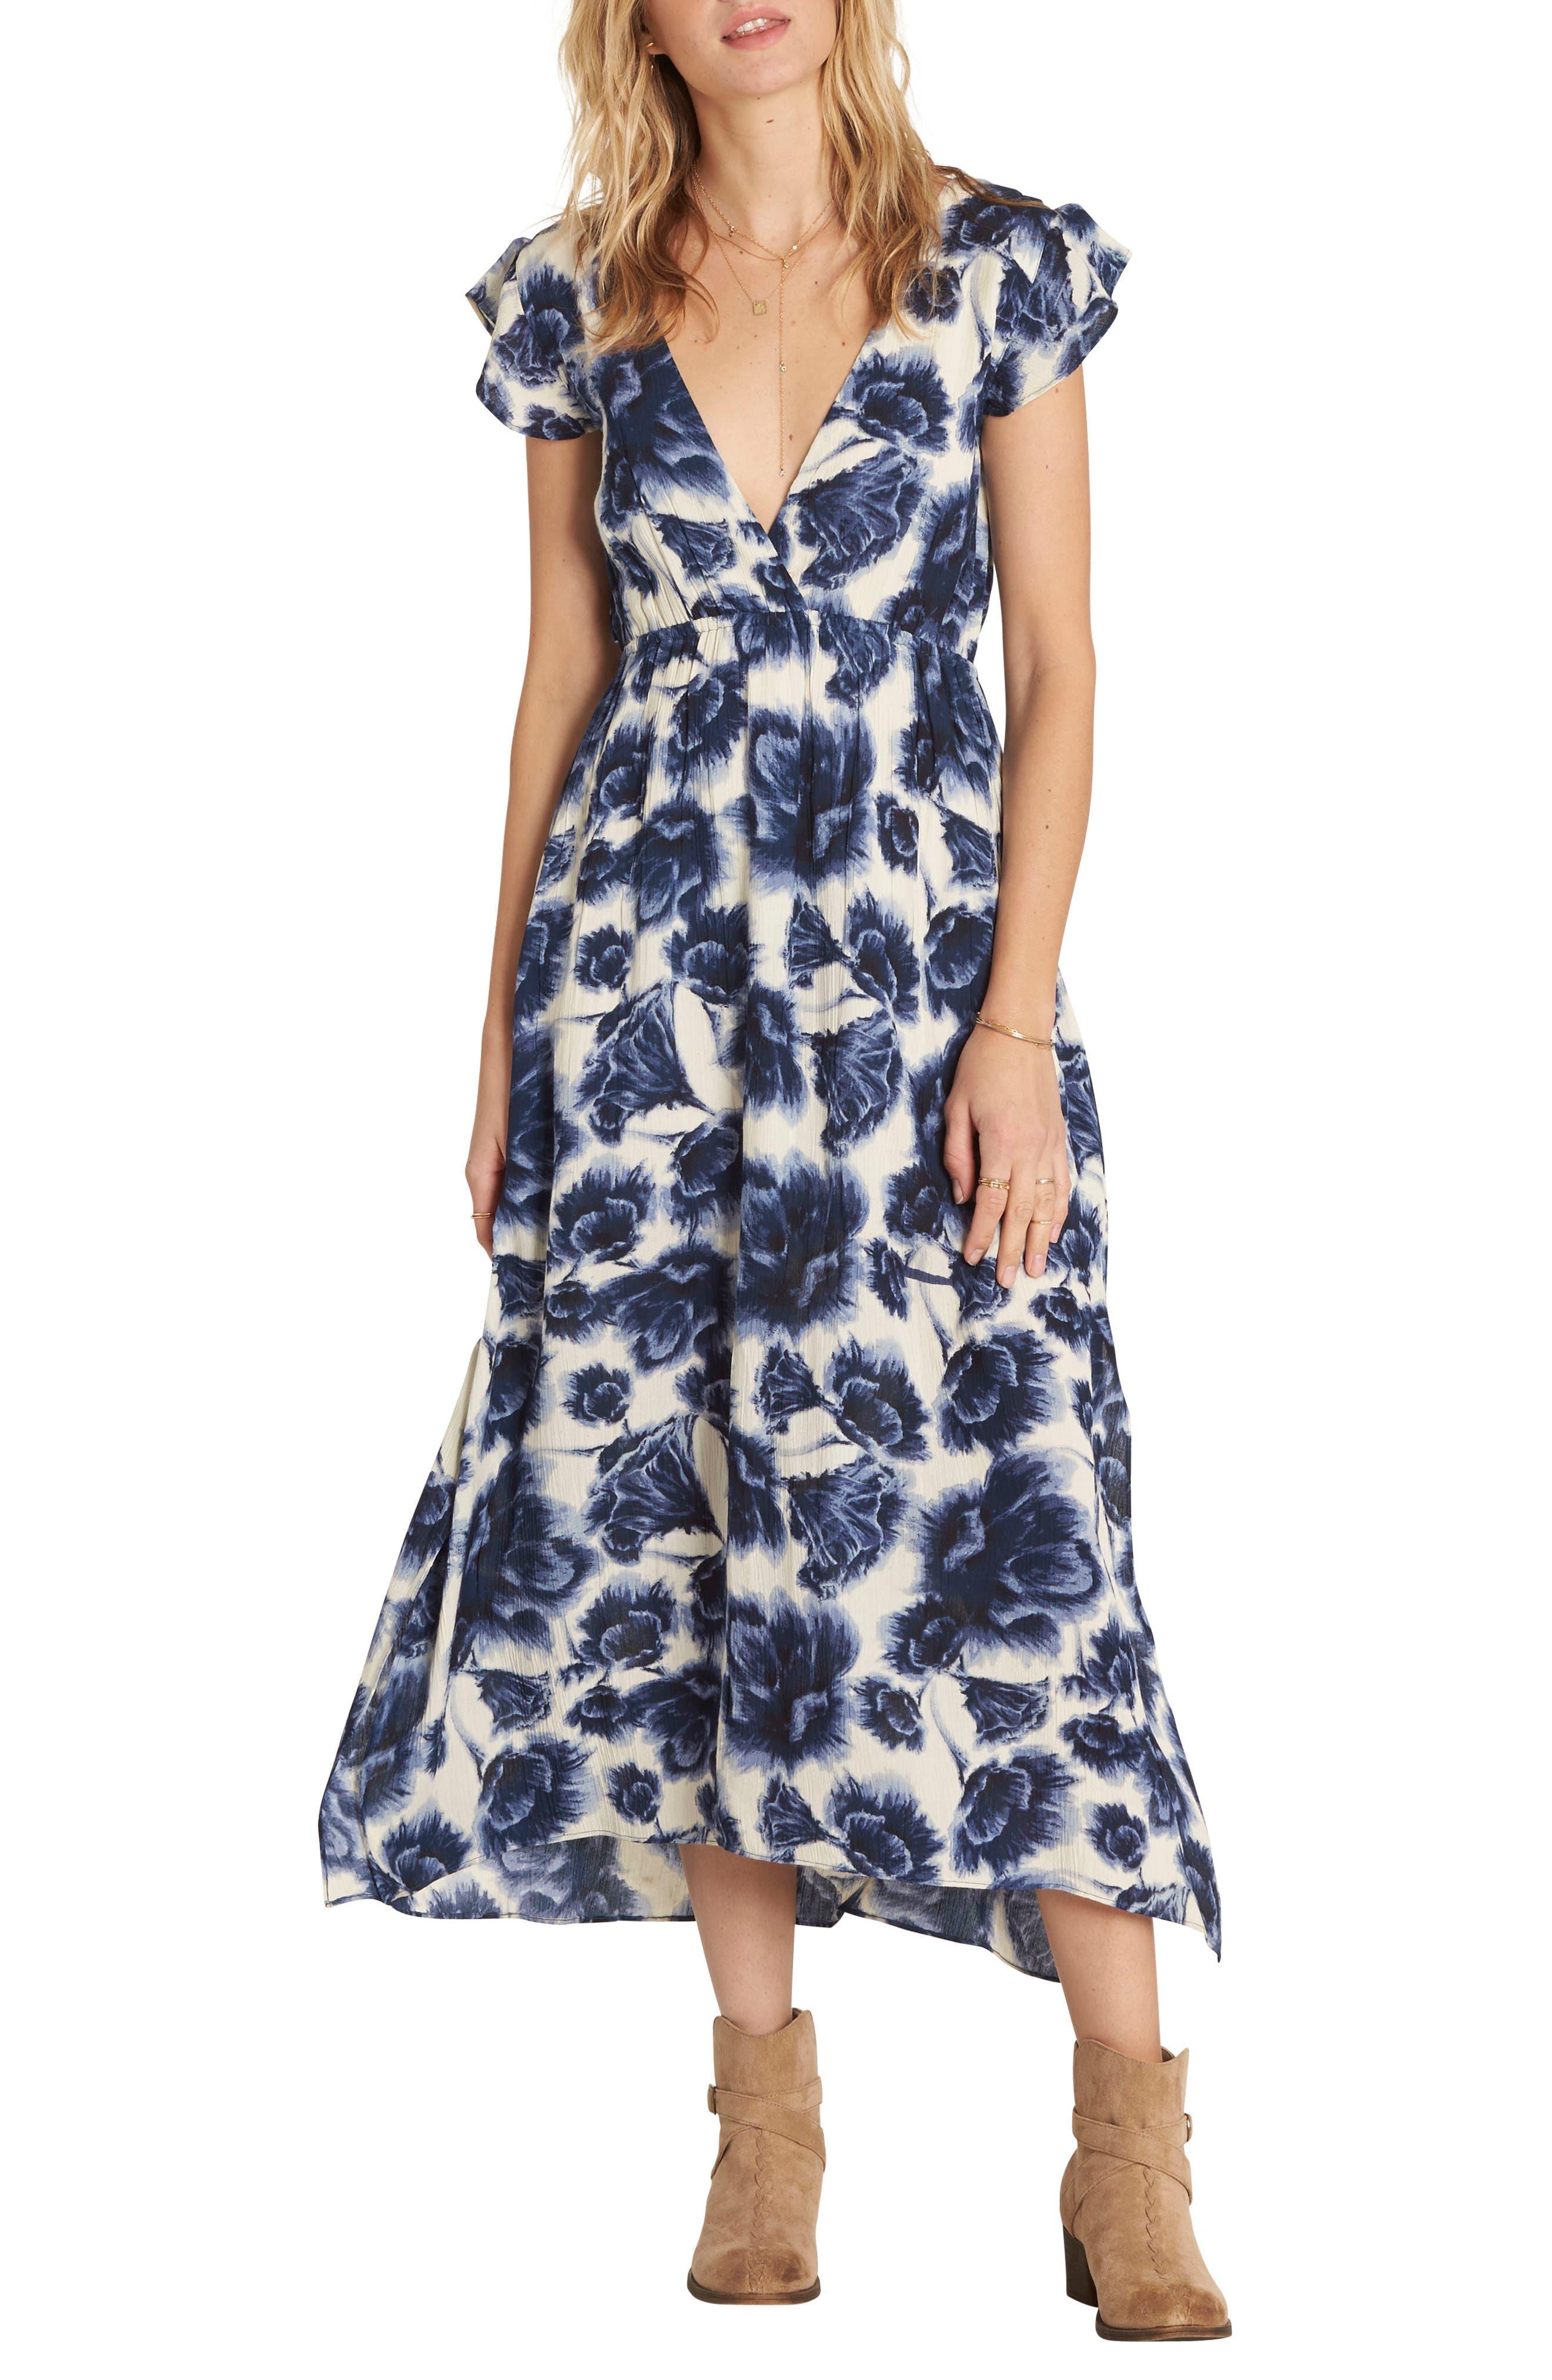 Alternate Image 1 Selected - Billabong Don't Mess Floral Print Dress